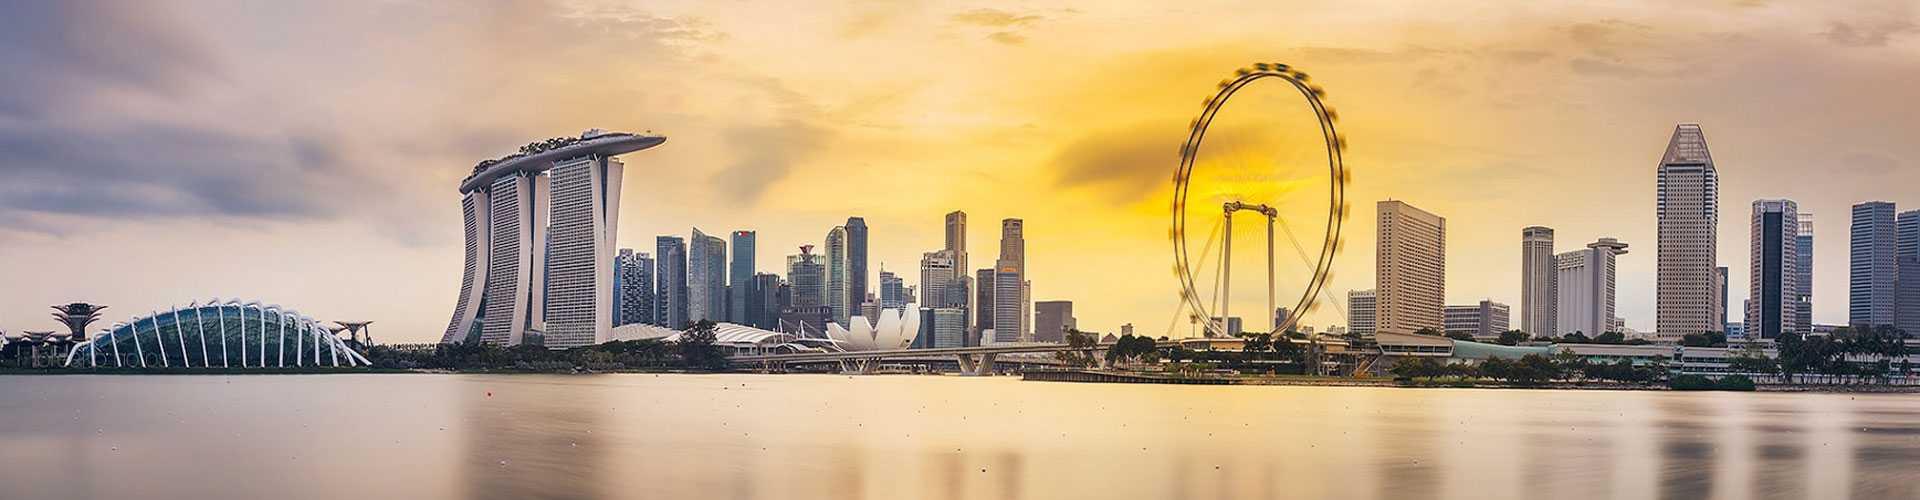 singapore attraction b24